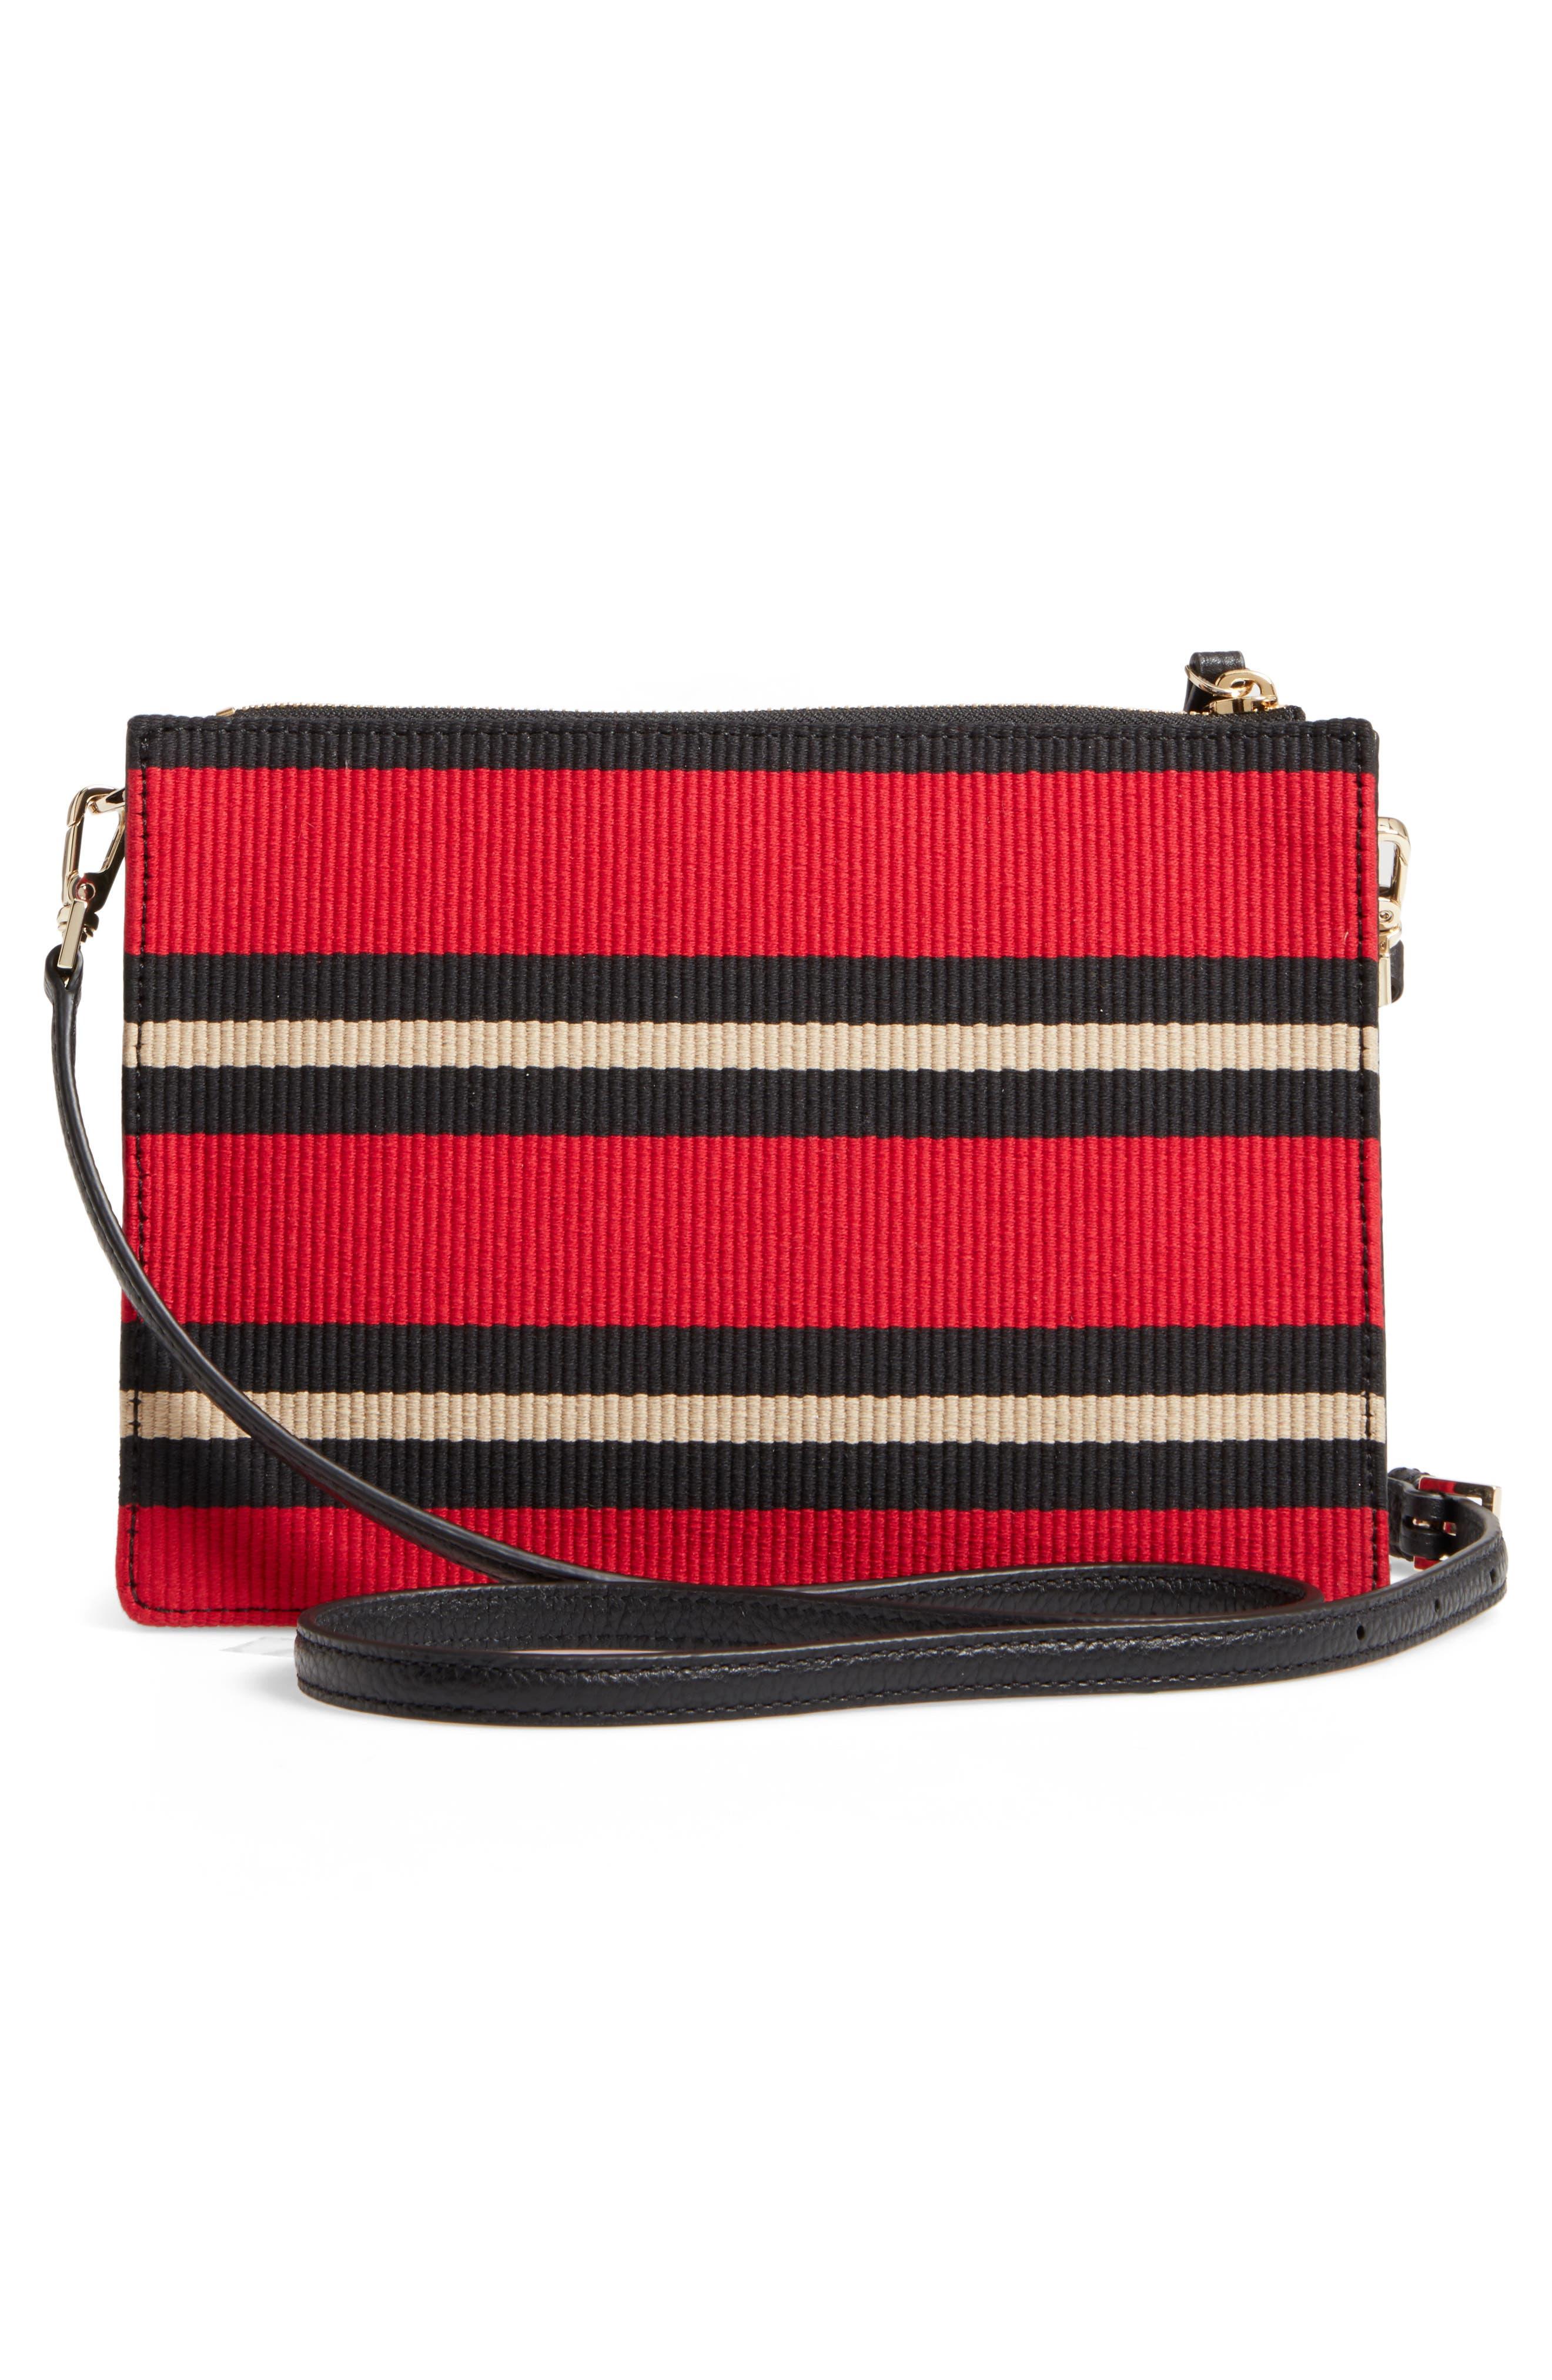 steward street clarise grosgrain stripe shoulder bag,                             Alternate thumbnail 3, color,                             600